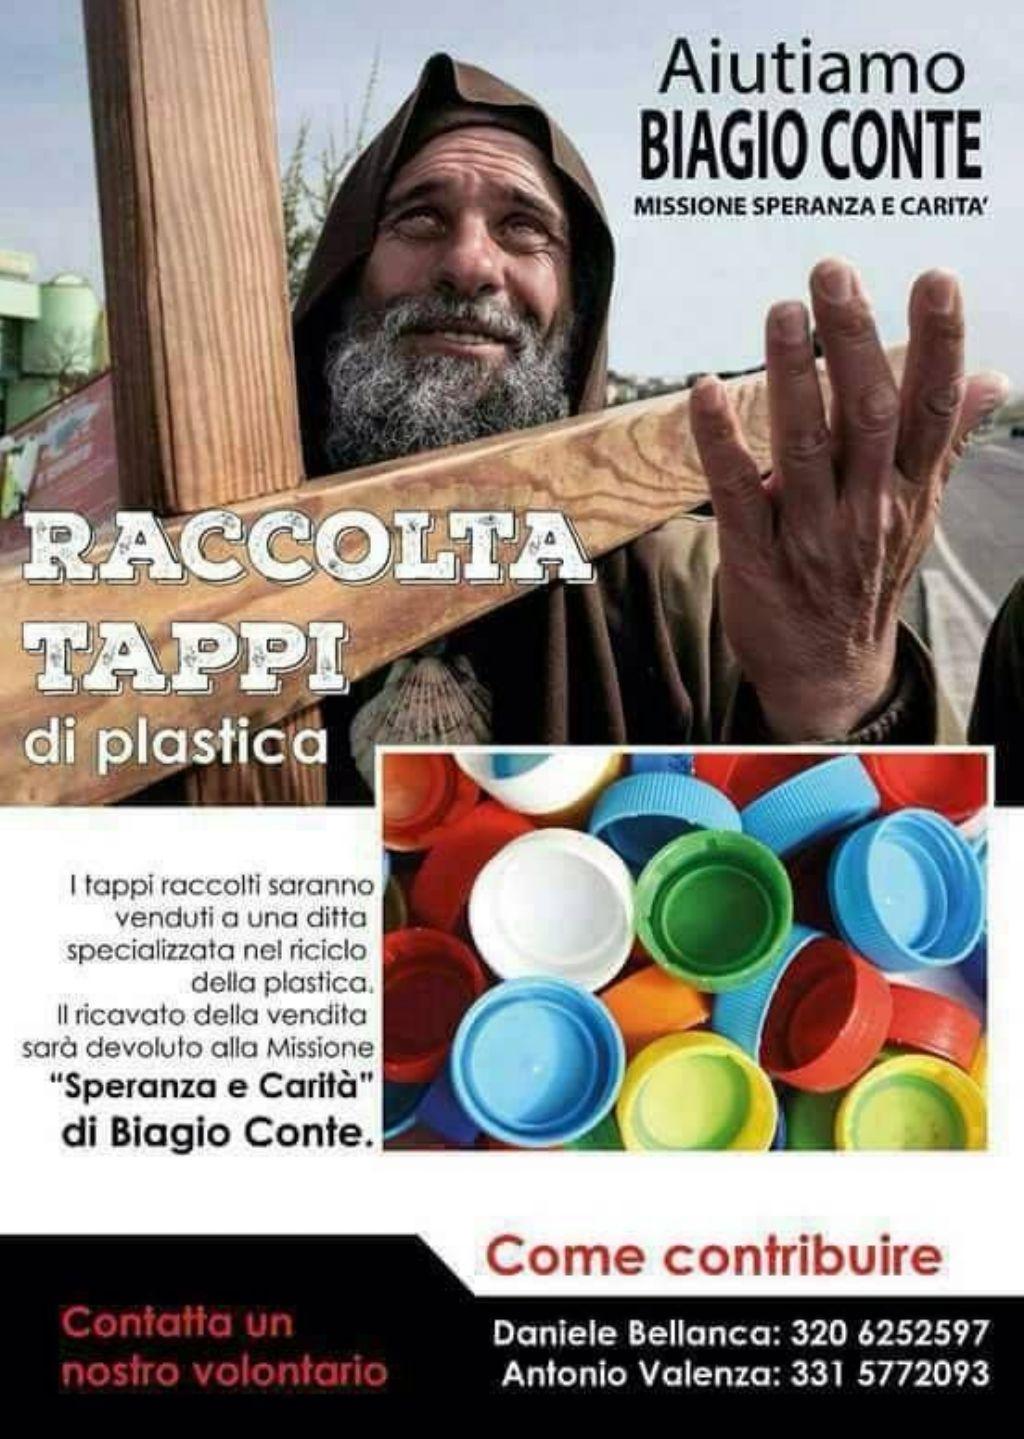 Aiutiamo Biagio Conte